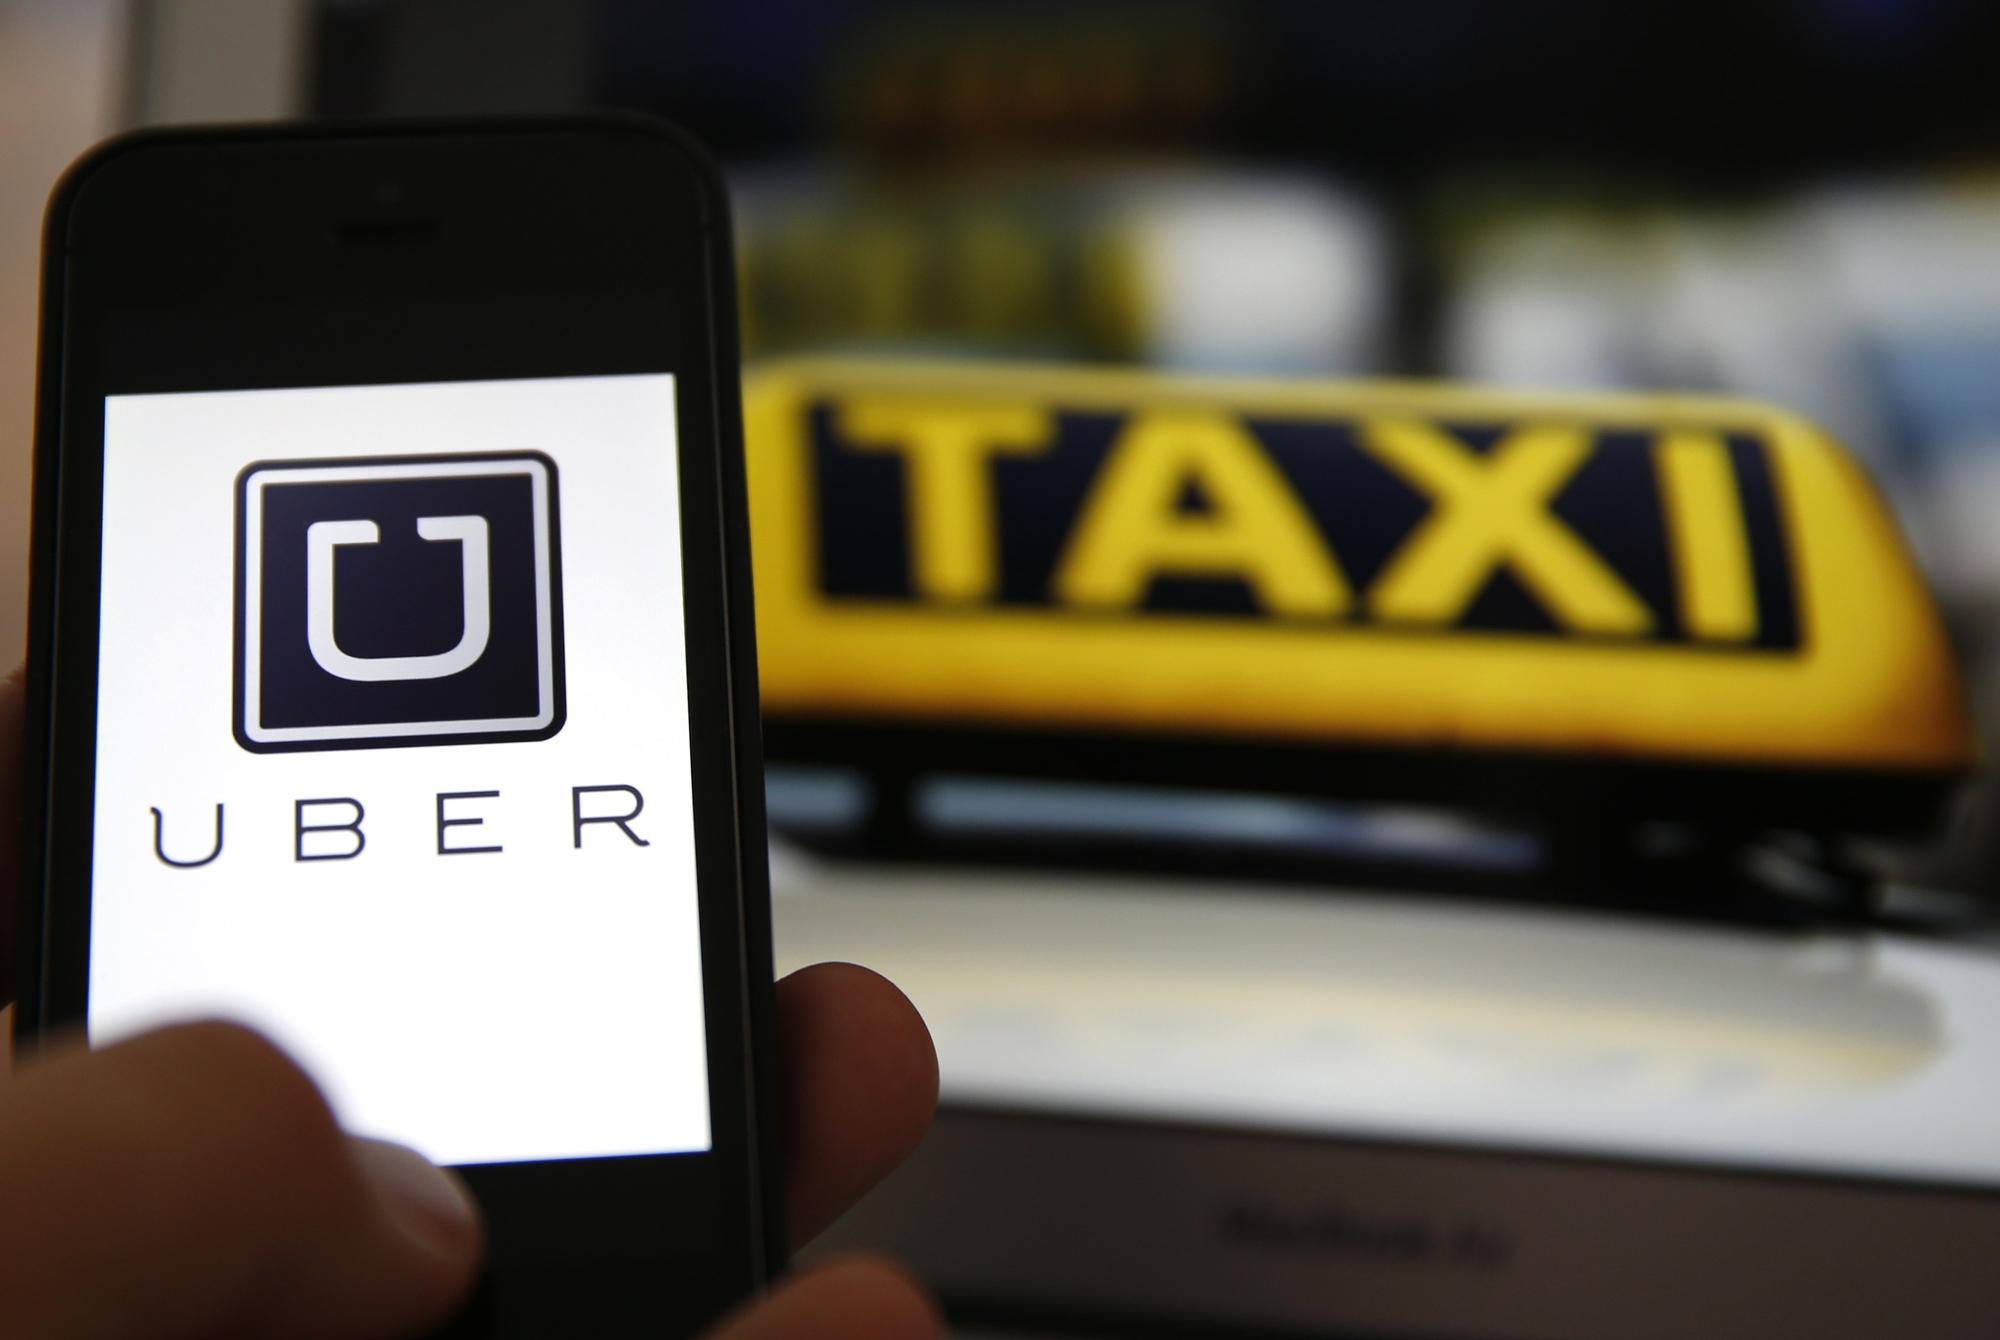 Uber is a taxi service: EU